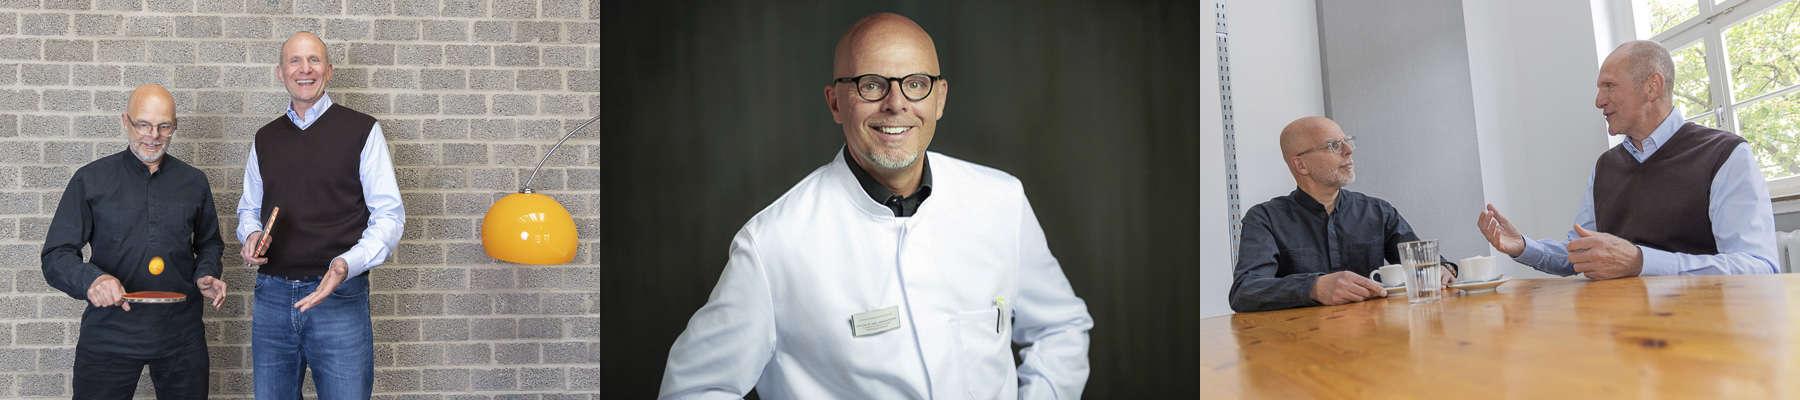 Dr. Johannes Kuchta im Rückenschmerzen Podcast mit Prof. Dr. Dieter Müller